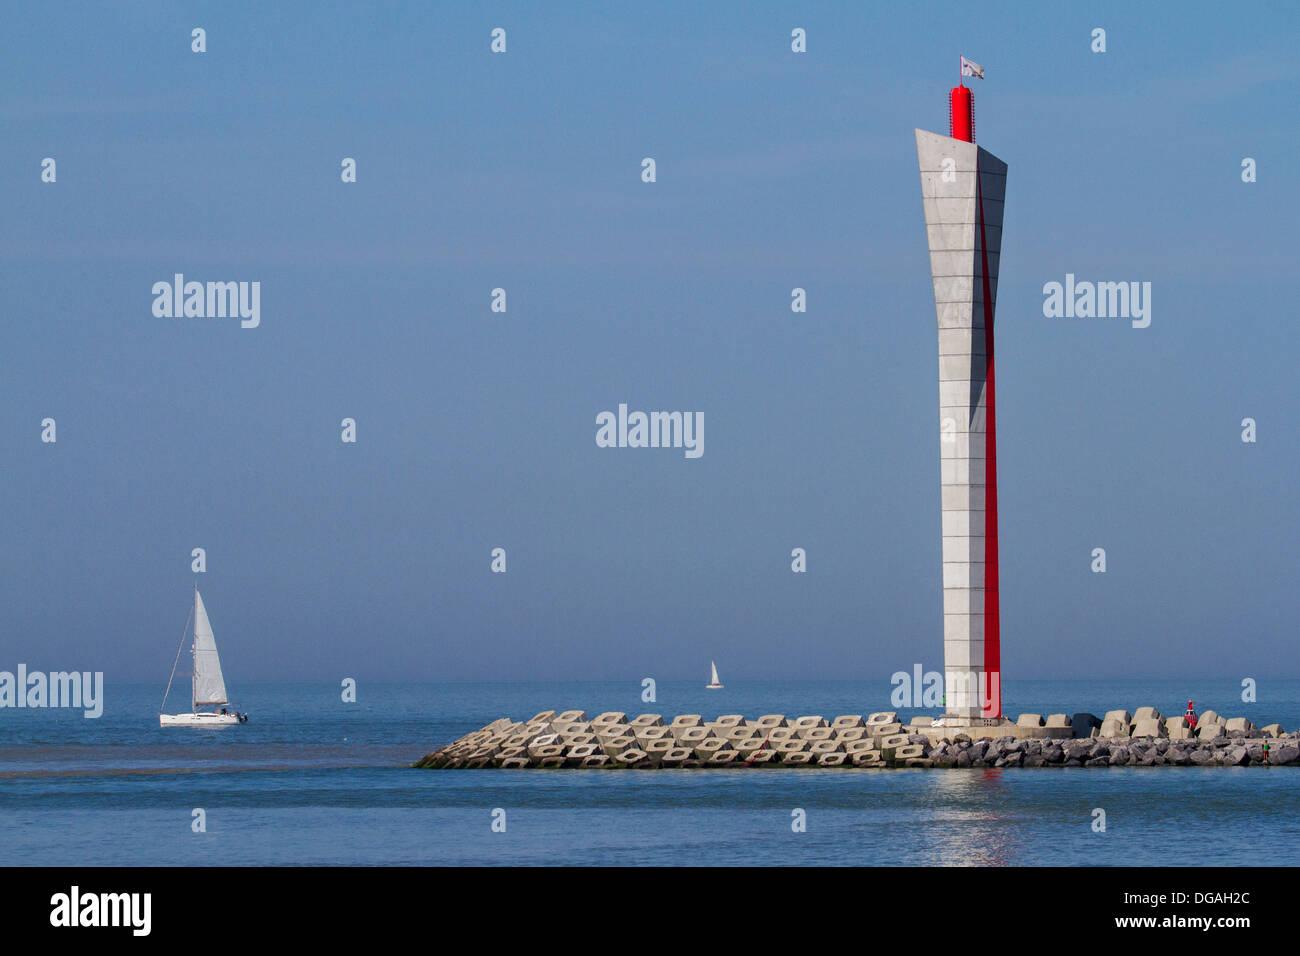 Radar tower on the longitudinal embankment along the North Sea coast at Ostend, Belgium - Stock Image